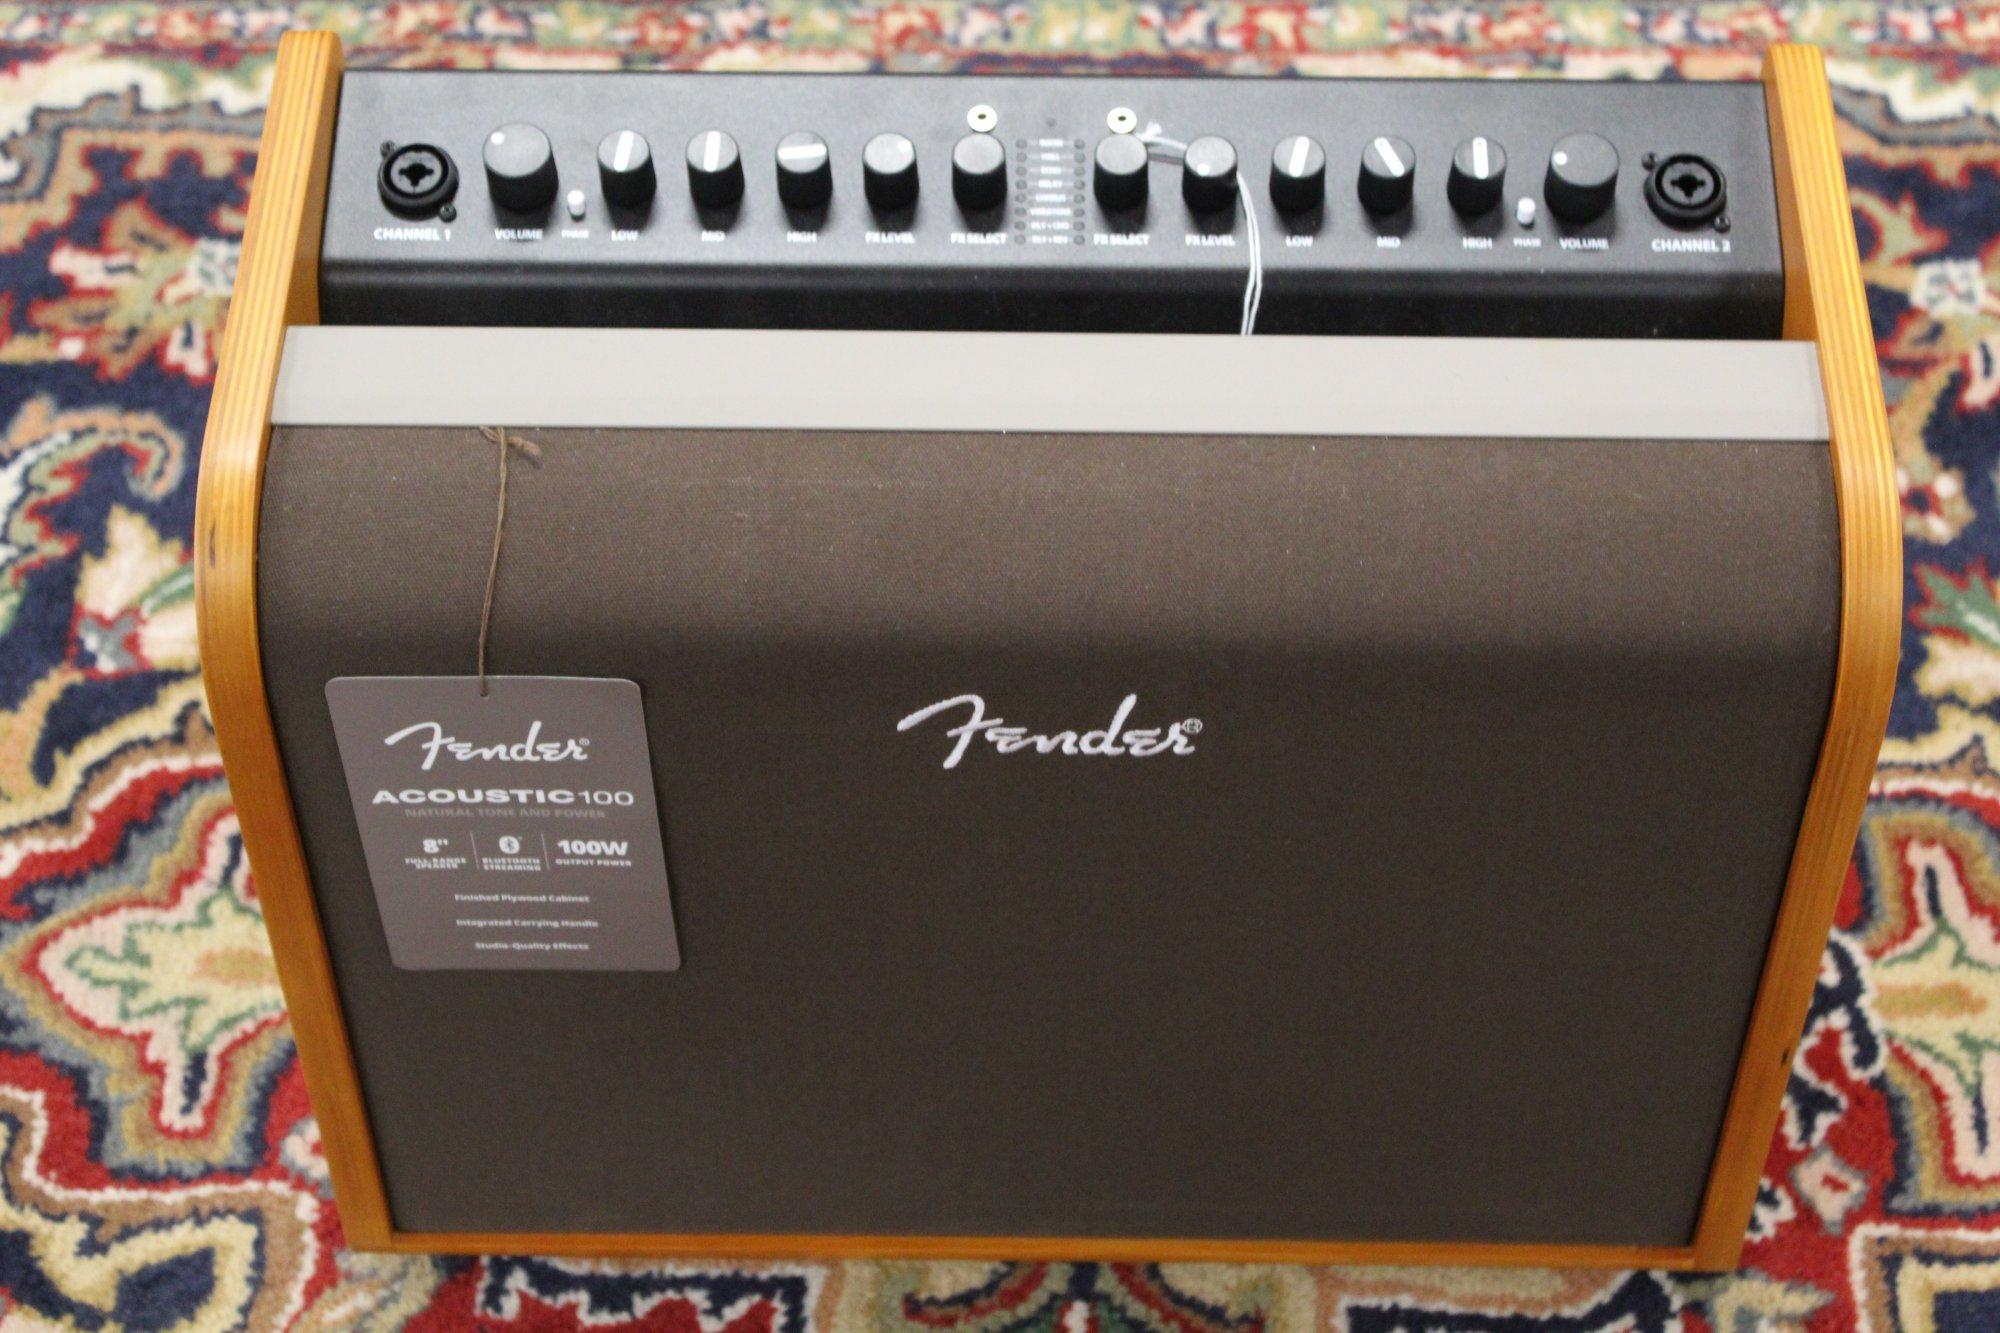 Fender Acoustic 100 120V